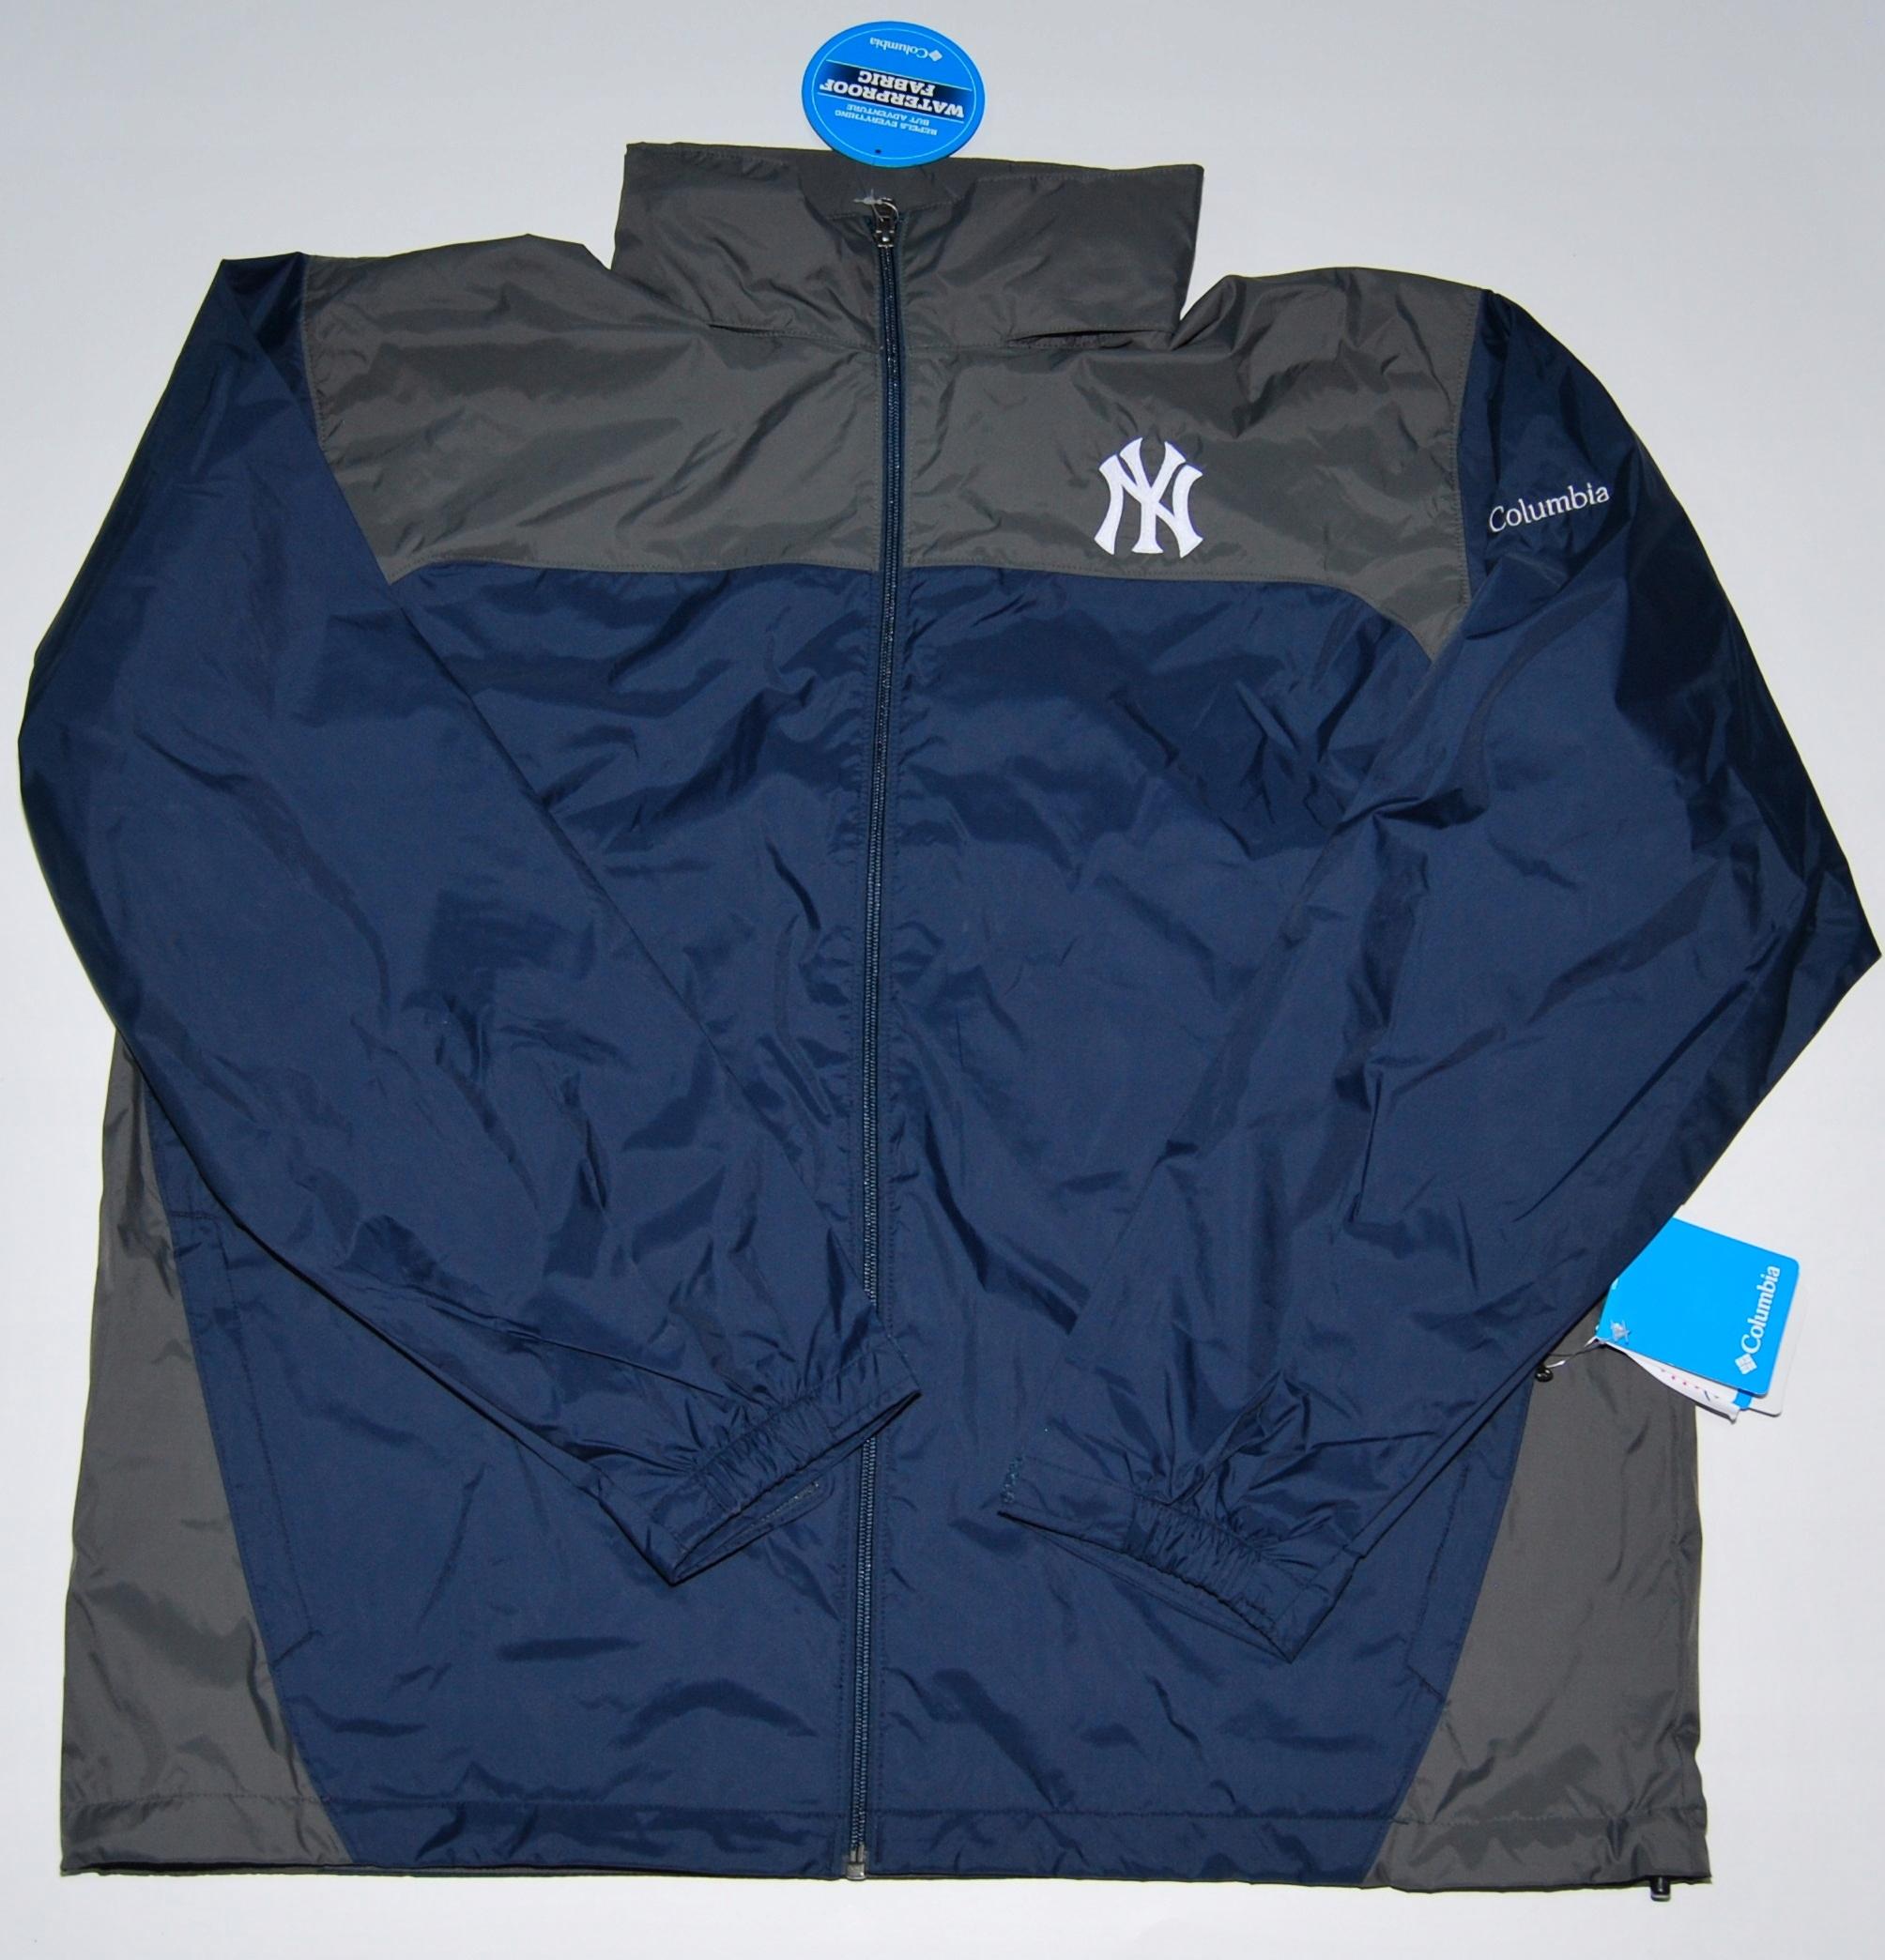 Columbia New York Yankees kurtka wiatrówka XL MLB